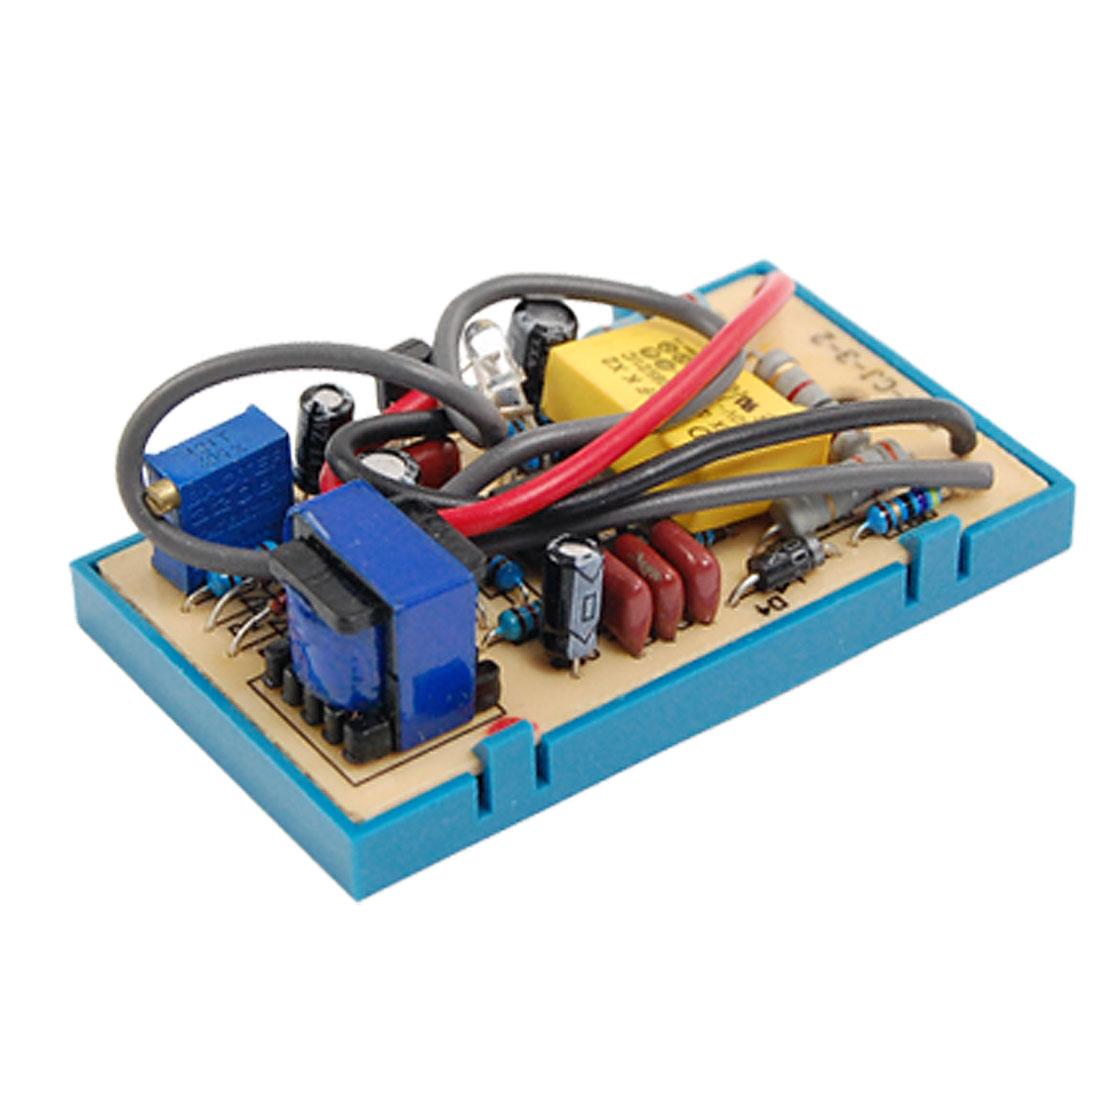 "AC 120V-280V Input Voltage 34"" TV Set Monitors Power Supply Modules"